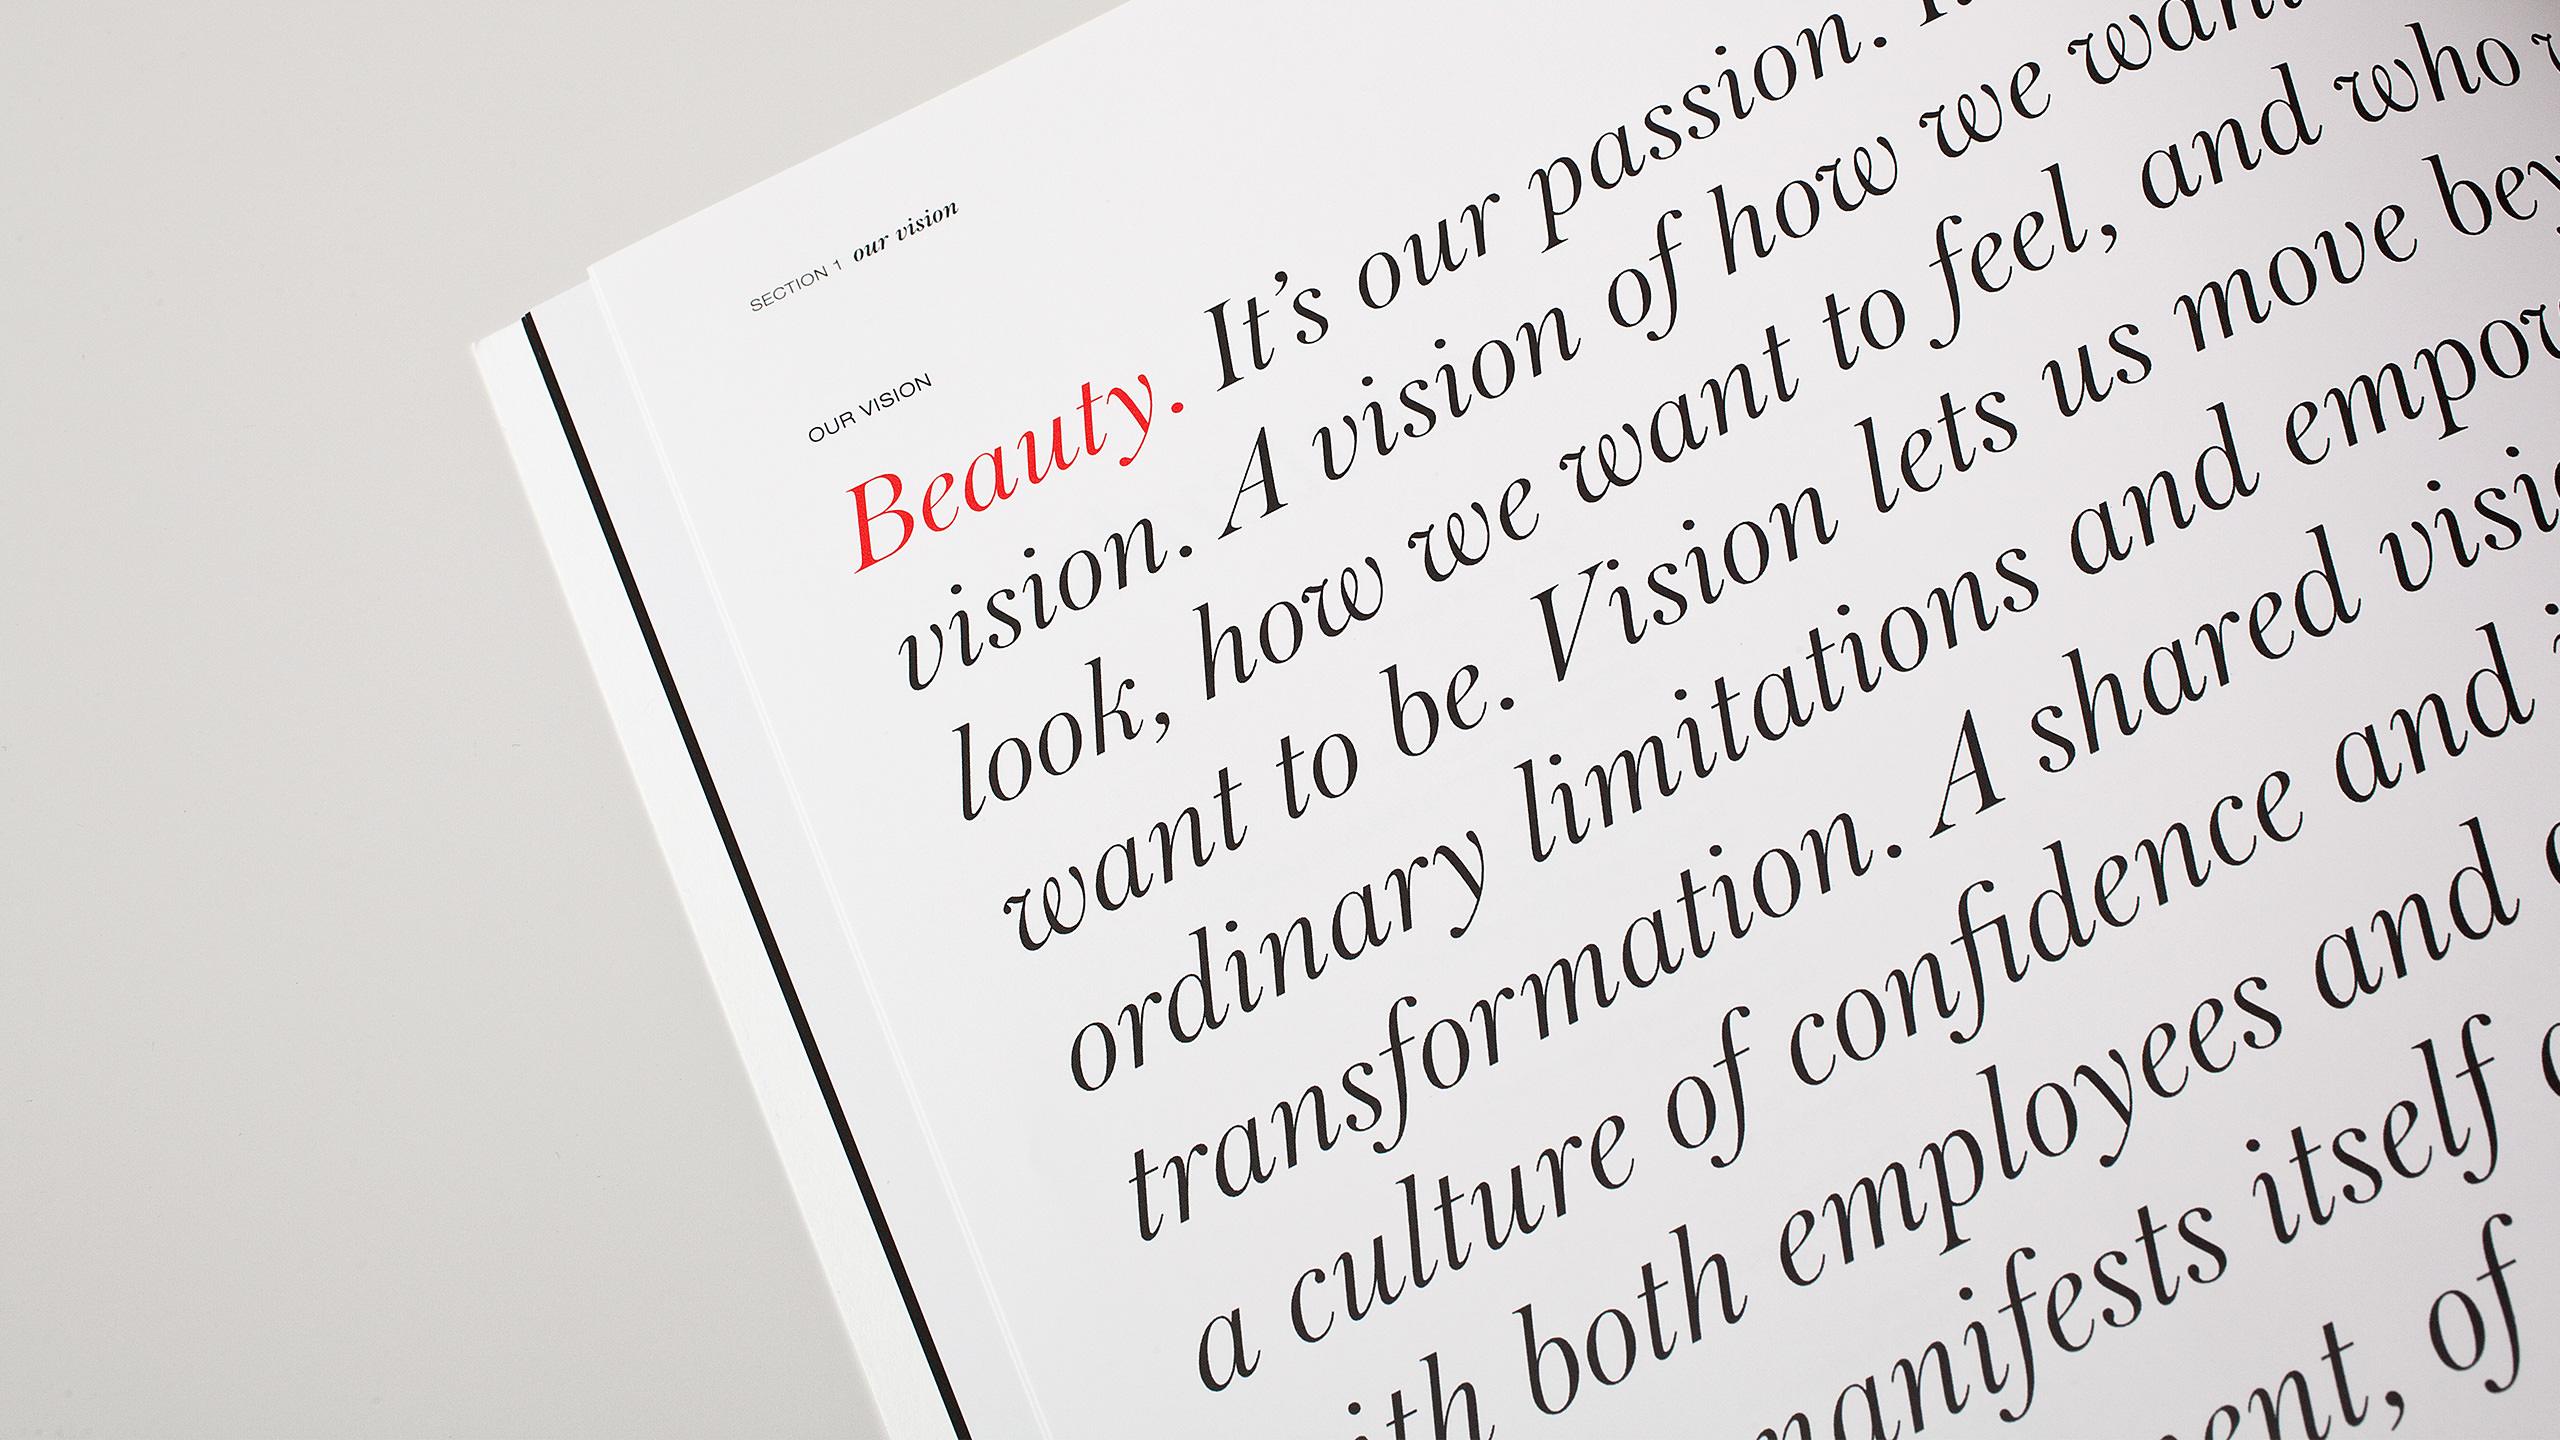 Sephora Retail Book - Beauty Spread